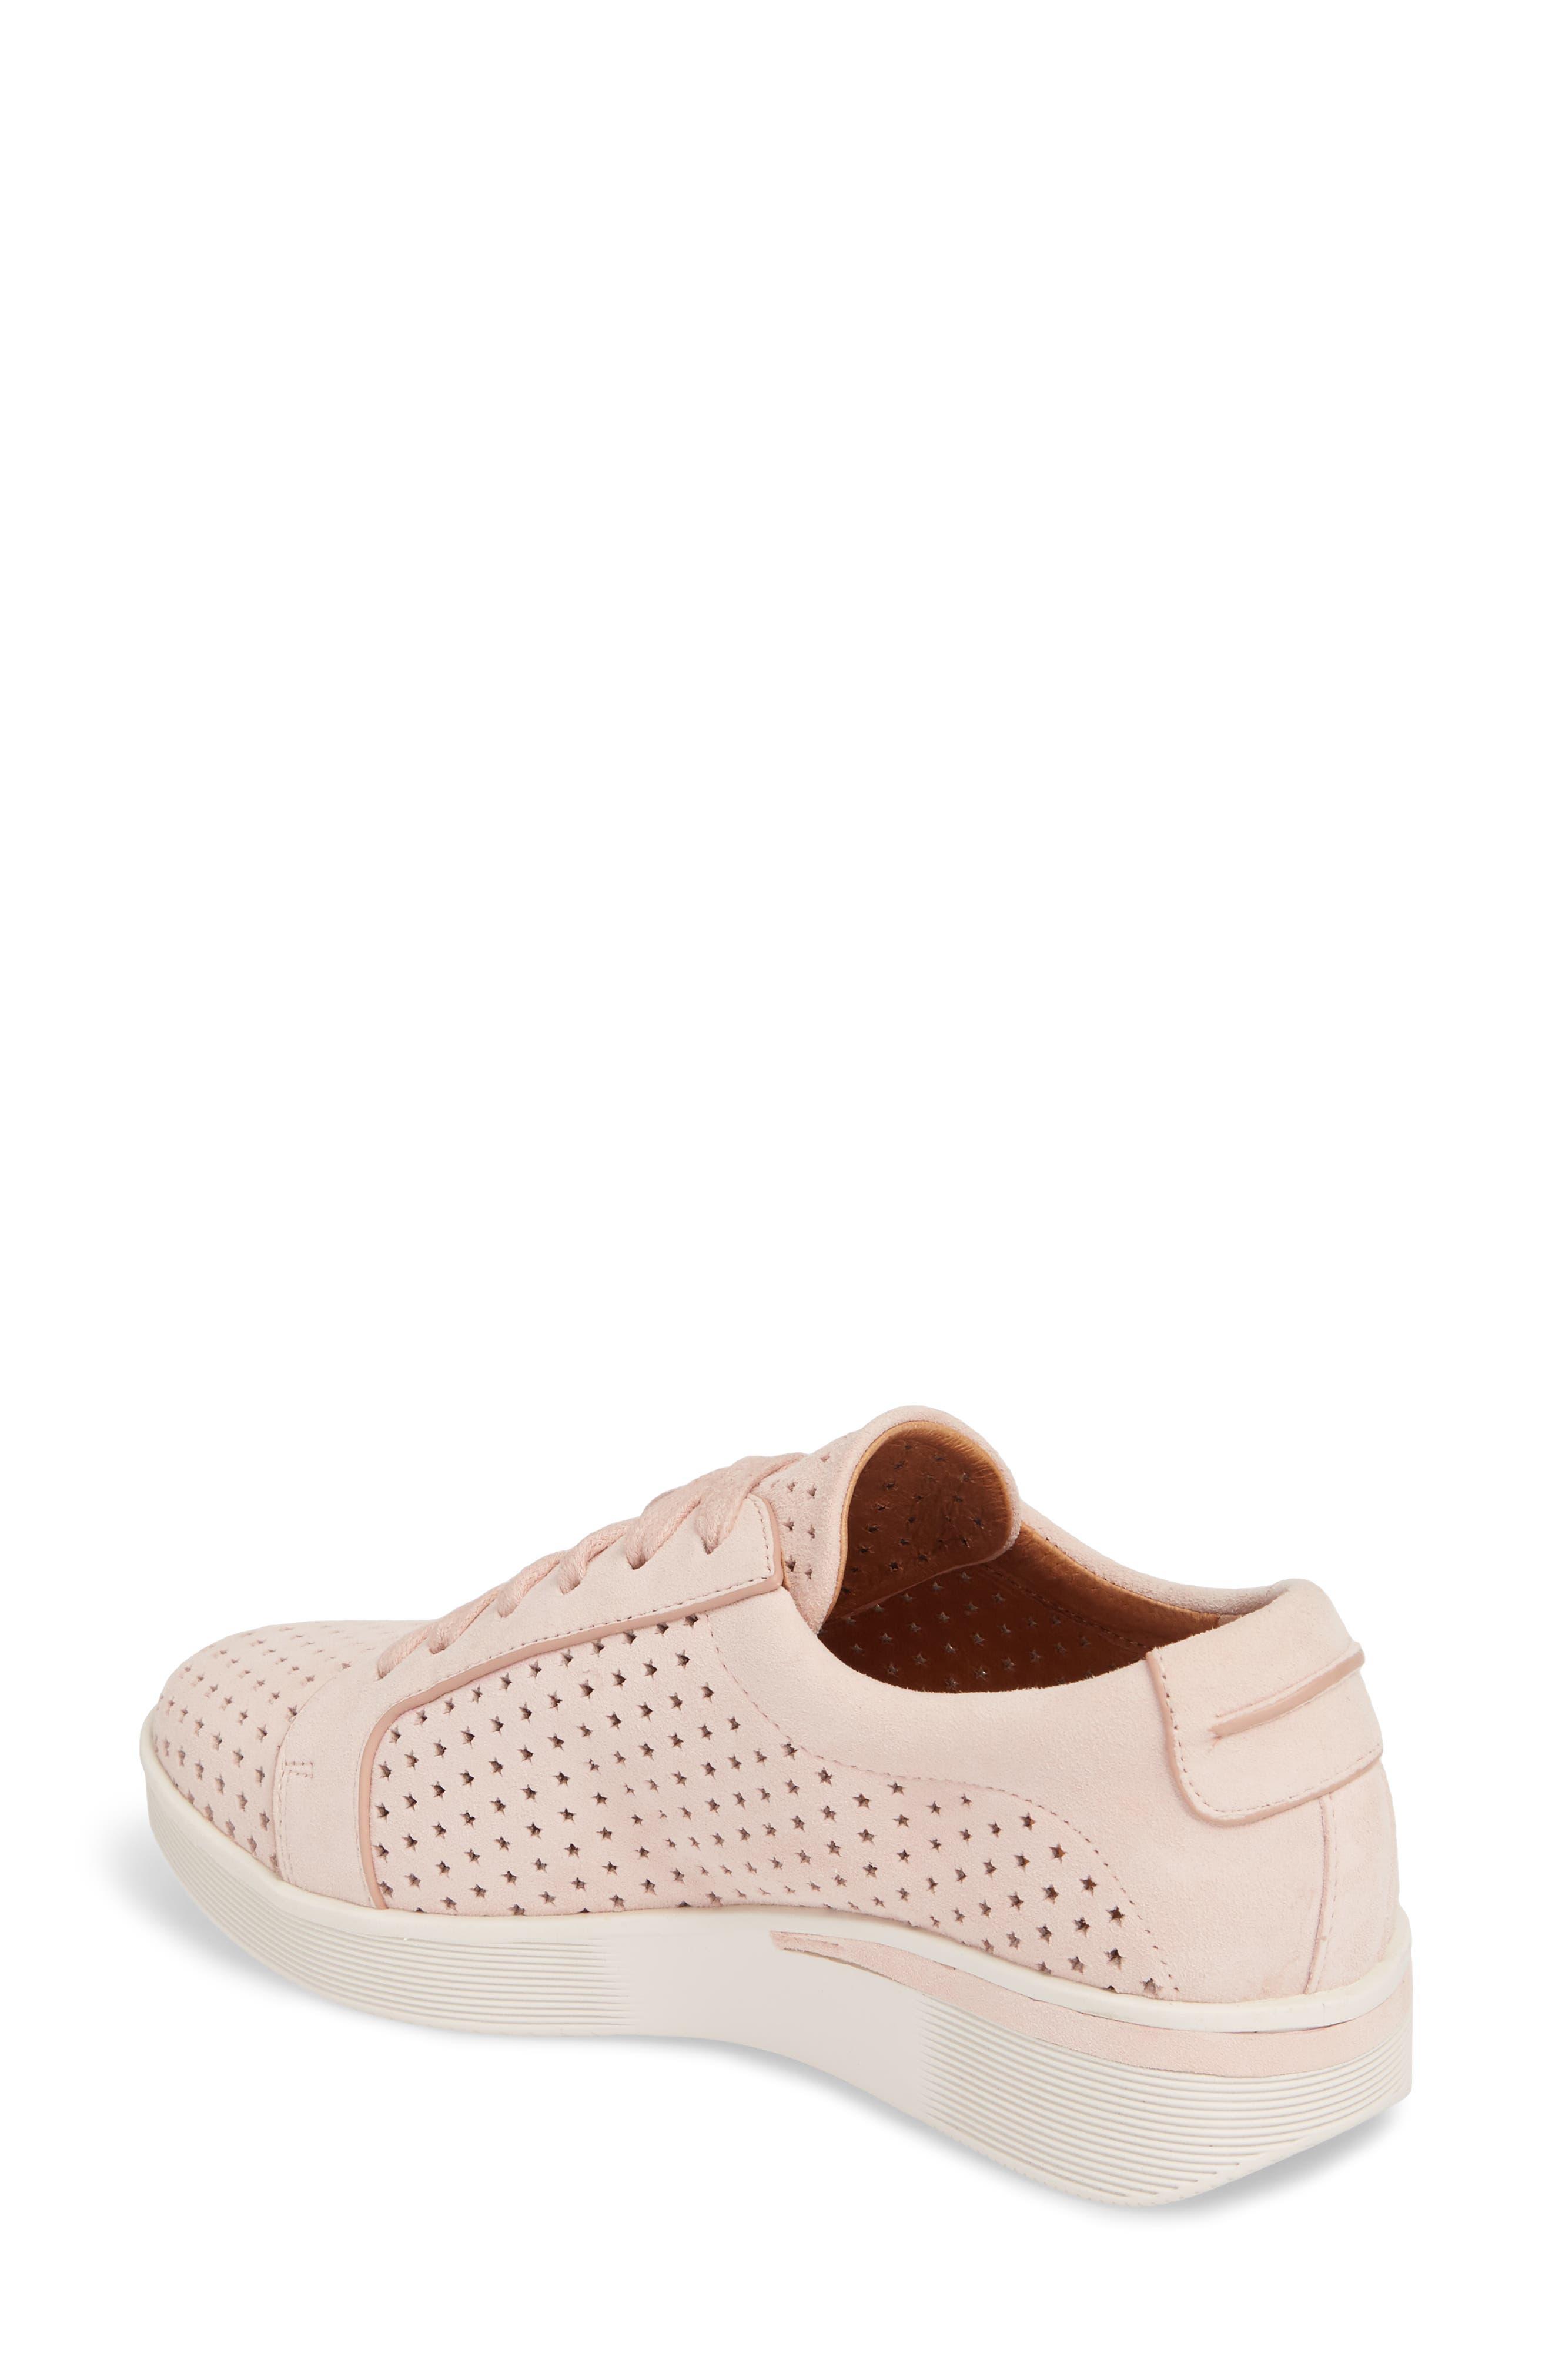 Haddie Low Platform Sneaker,                             Alternate thumbnail 2, color,                             PEONY